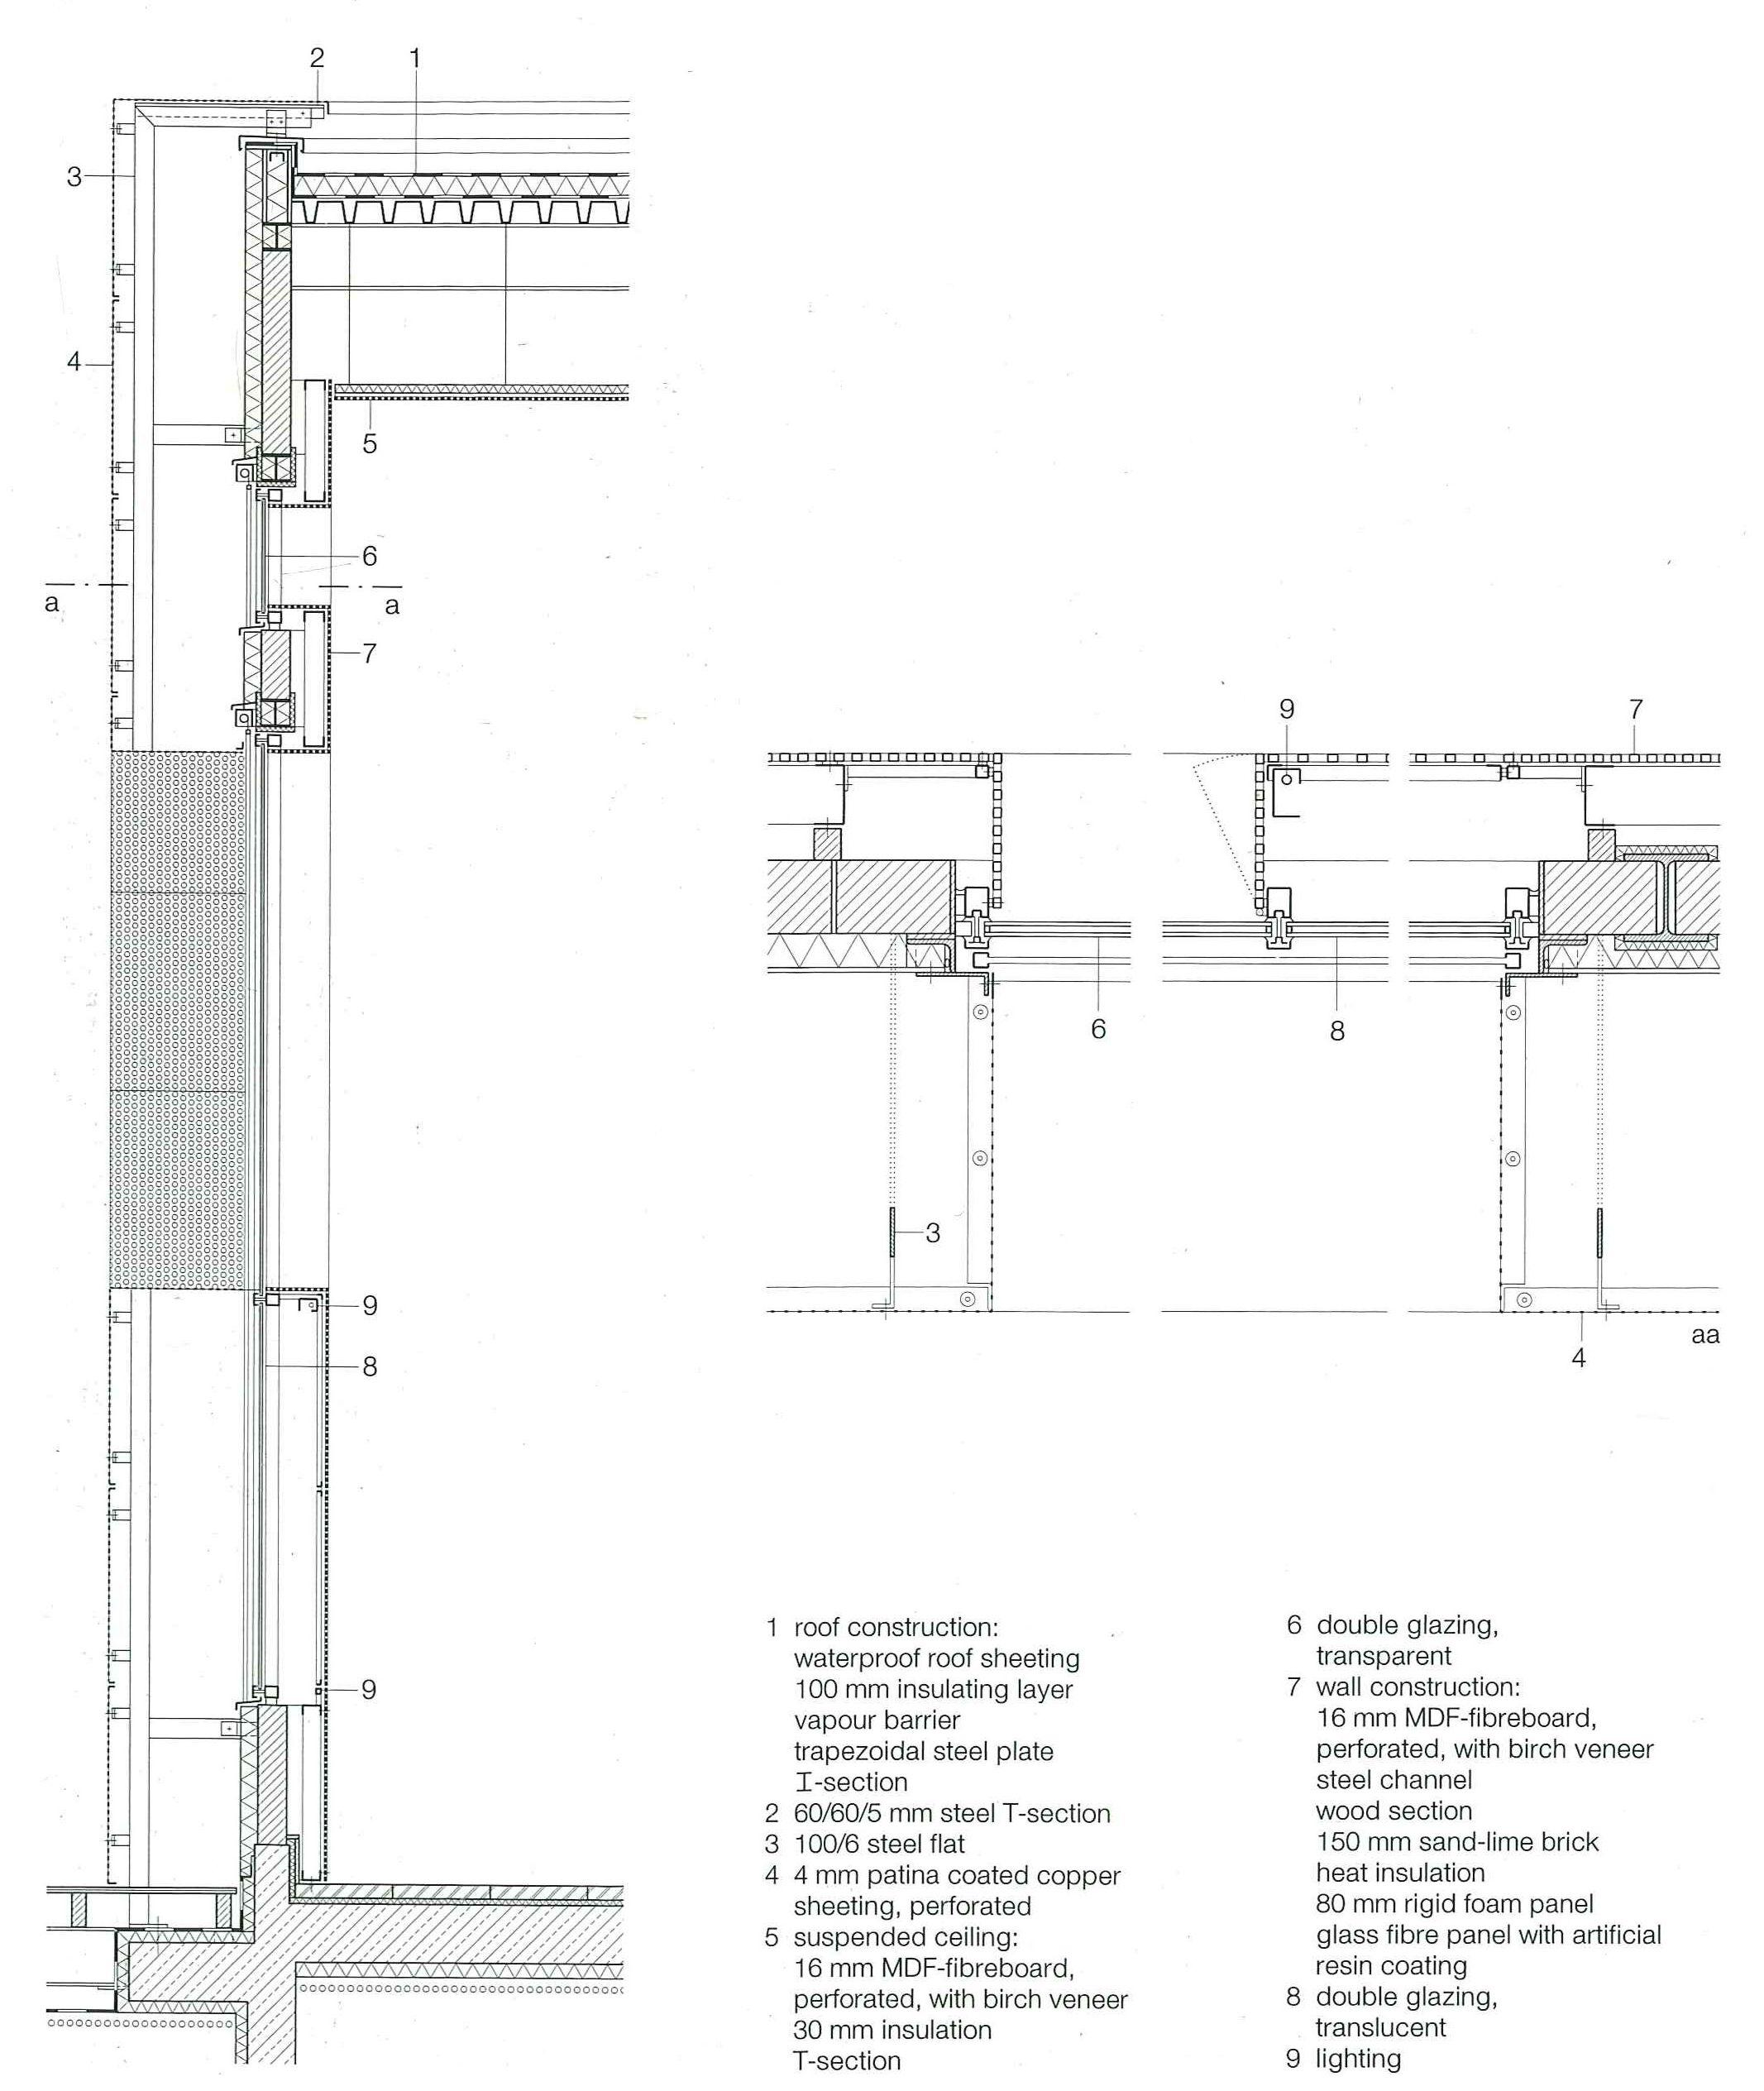 Steven Holl Construction Details Google Search Architecture Doubleglazingdiagram01jpg Amsterdam1 21332528 Expanded Metal Design Plans